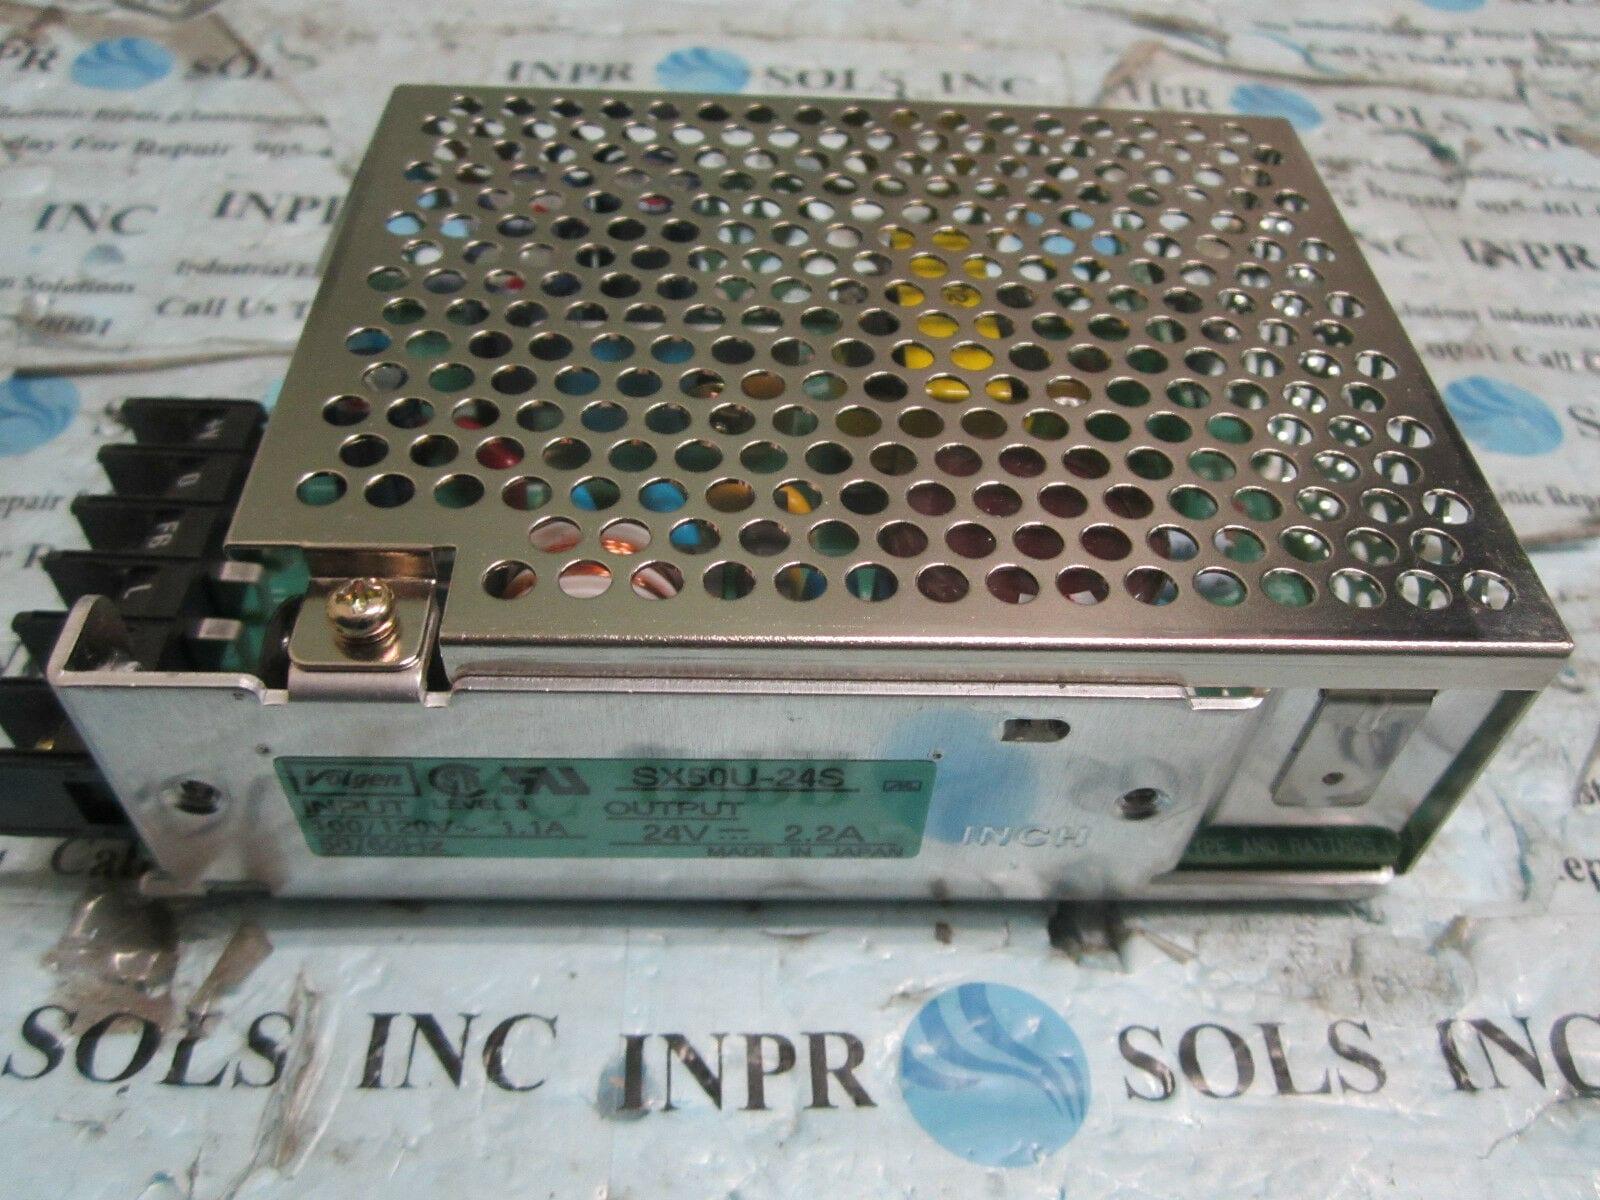 Volgen SX50U-24S DC Power Supply Input 100/120VAC Output 24VDC 2 2A *Tested*